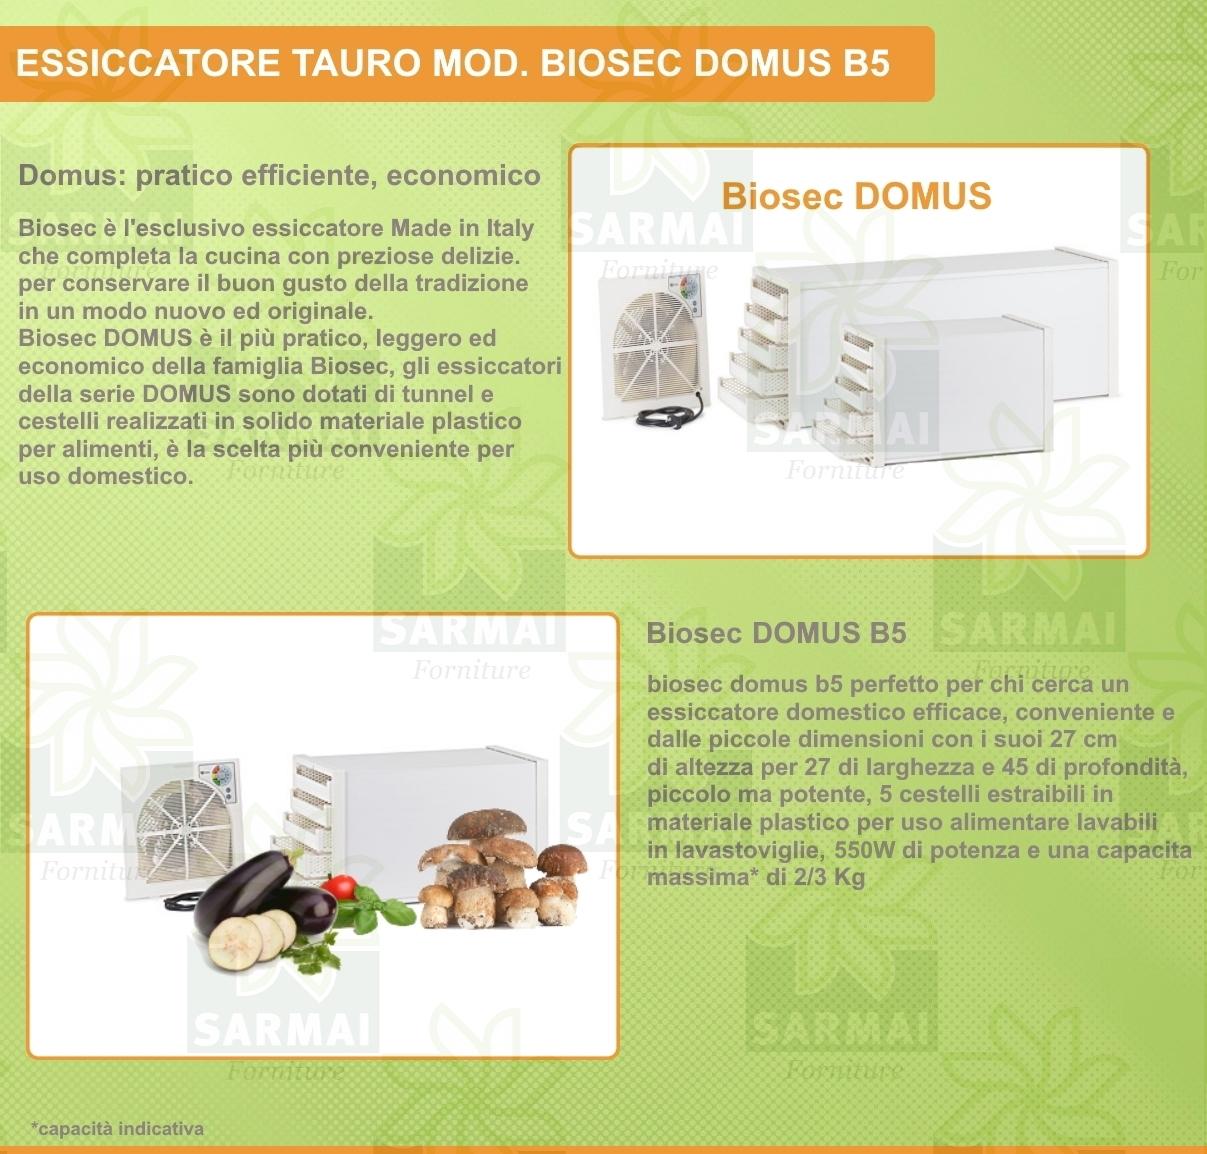 Essiccatore Tauro Domus Biosec B5